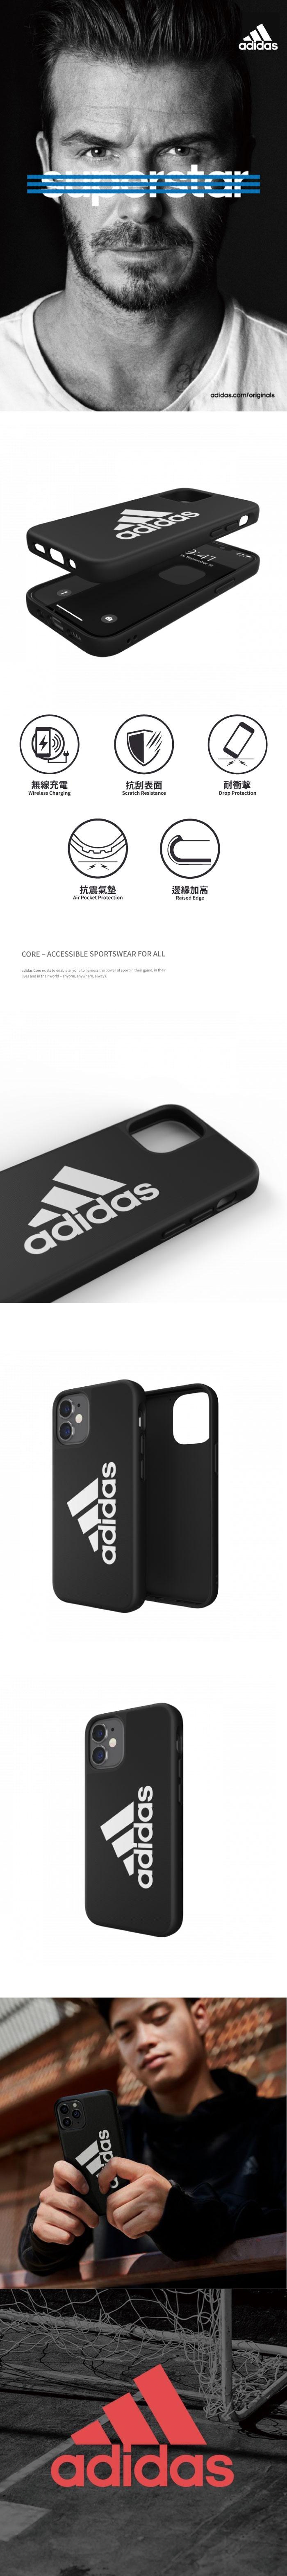 Adidas|iPhone 12 mini 手機殼 Sport 經典標誌 黑色